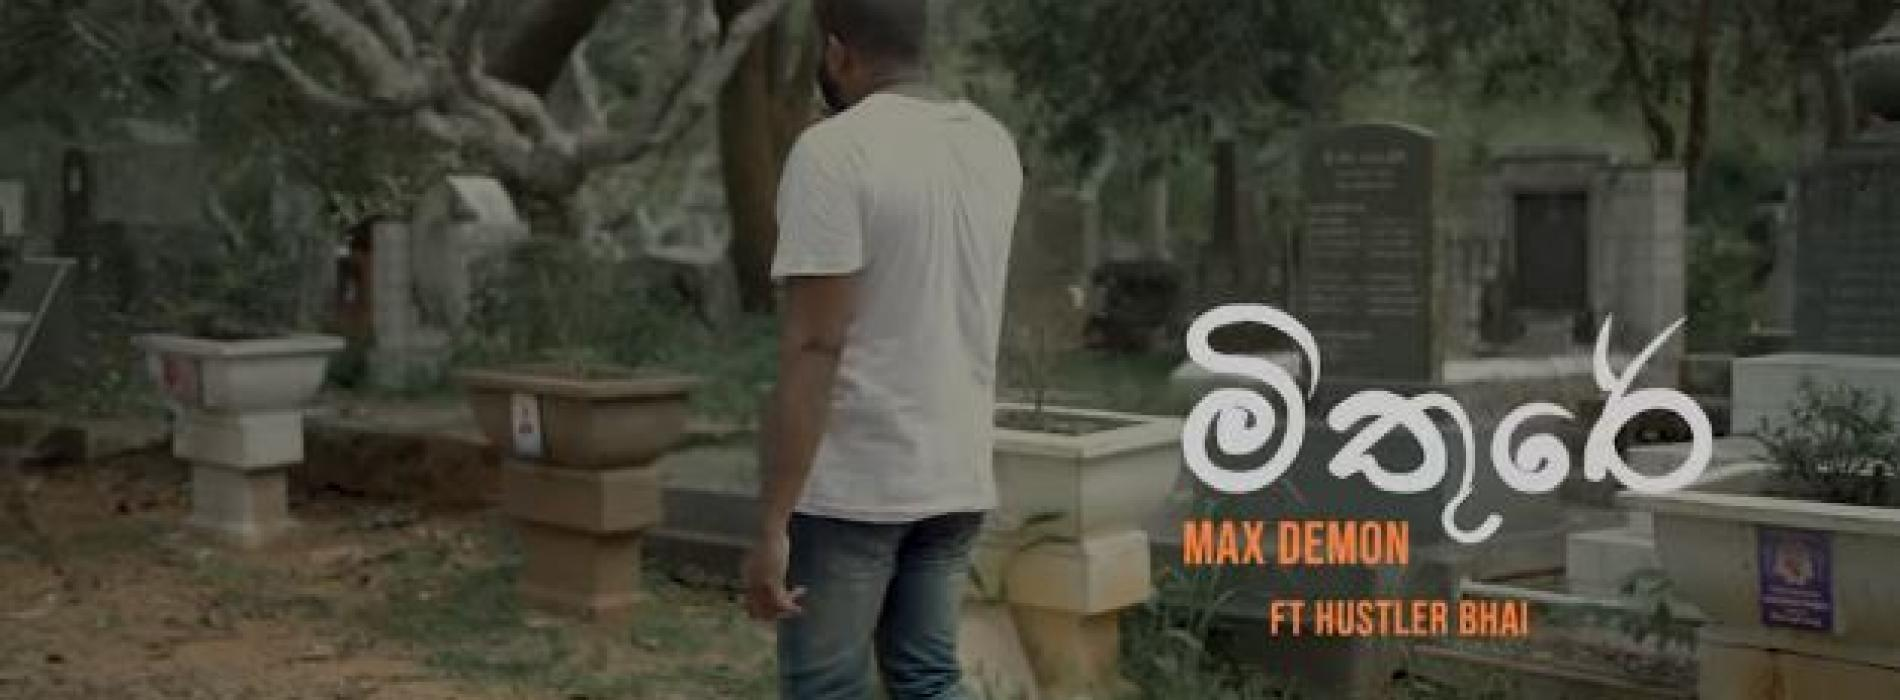 New Music : Mithure (මිතුරේ ) – Max Demon (J Place) ft Hustler Bhai (A Pain of Friends' Death)